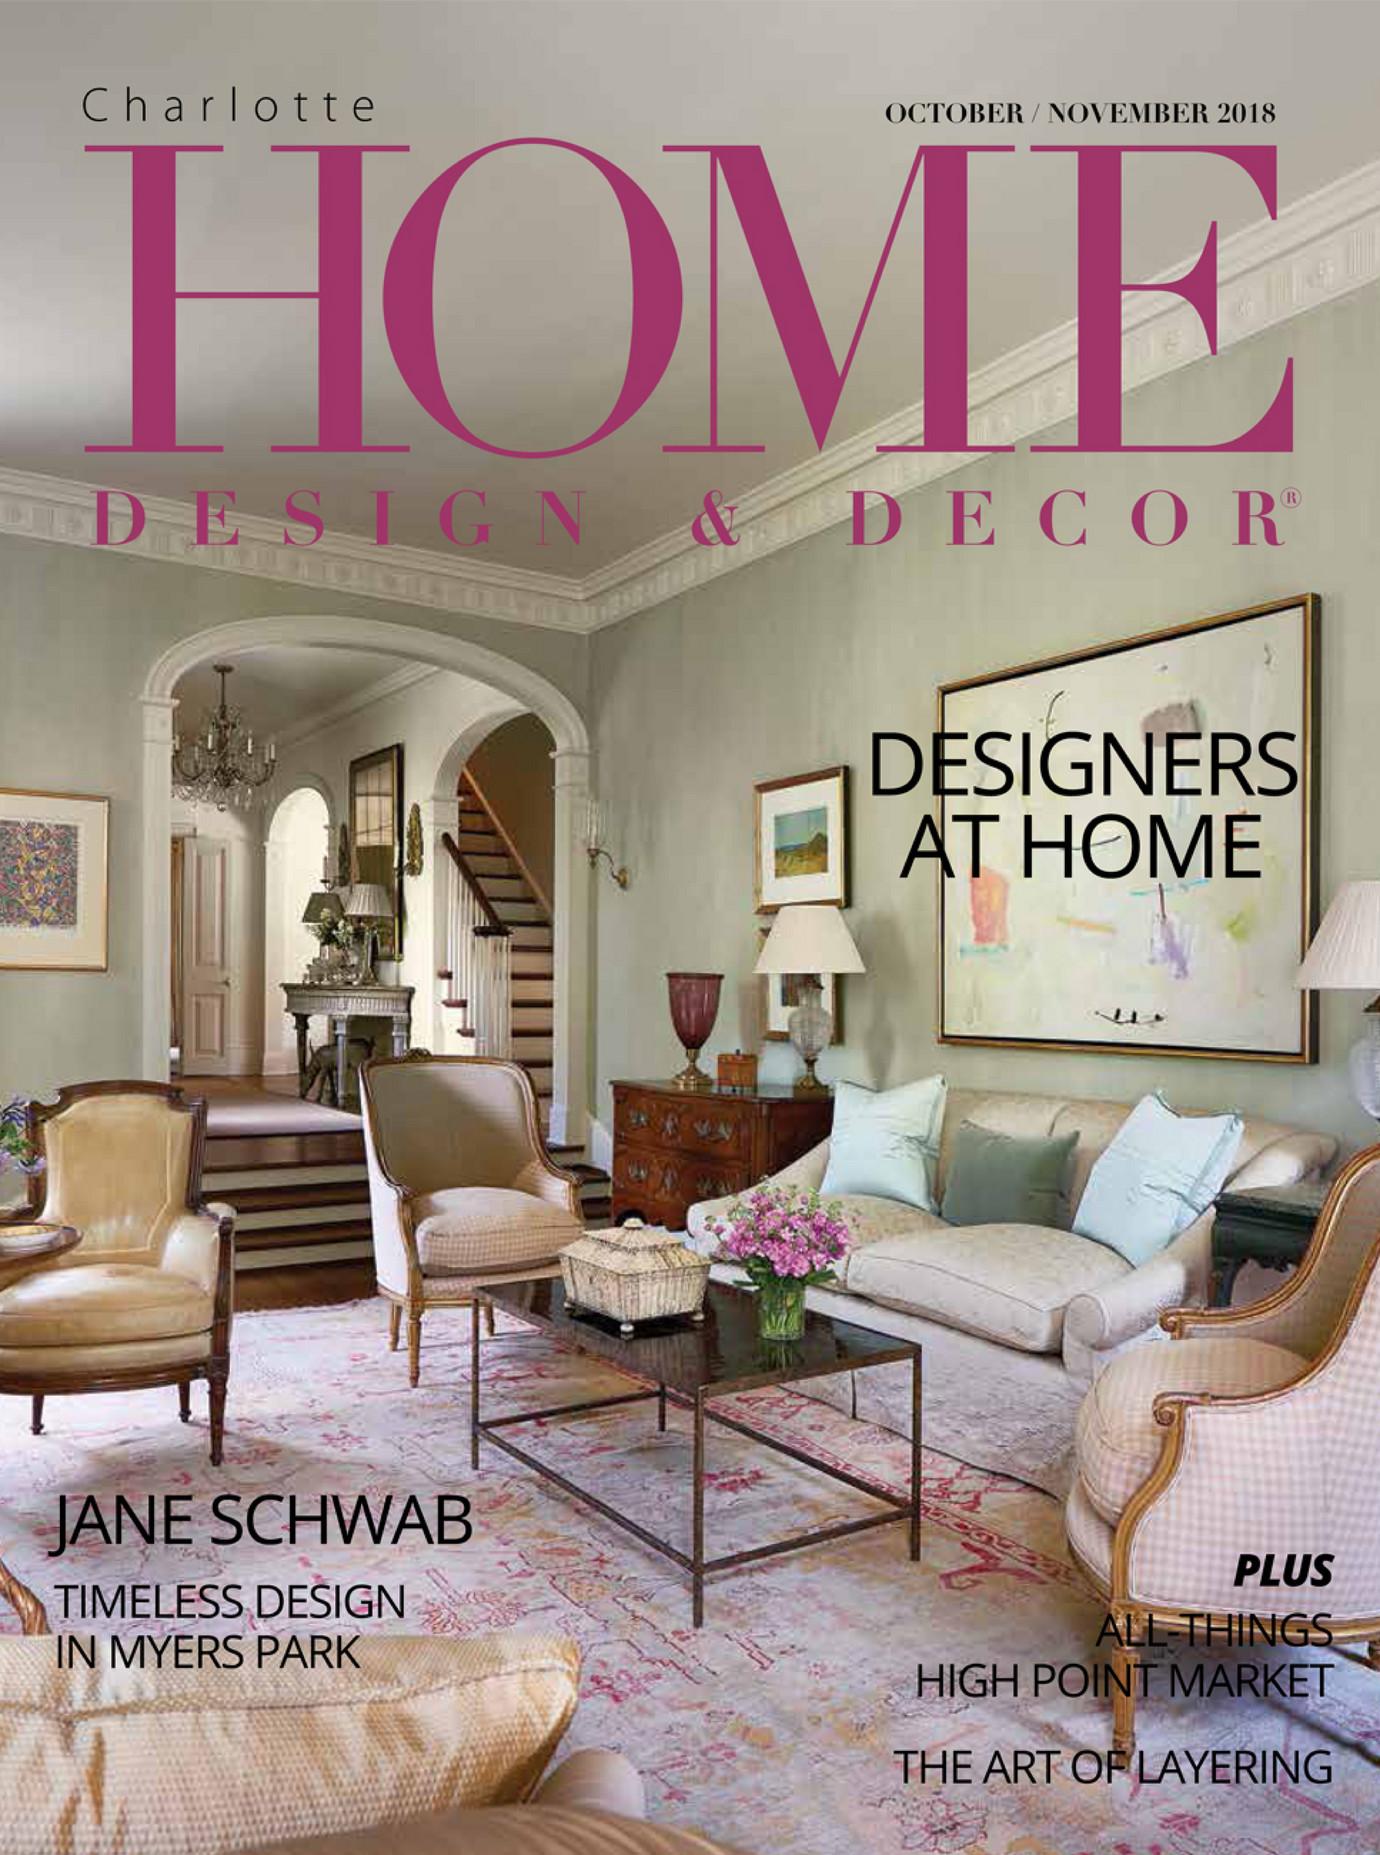 Home Design Et Deco devol brochures - home design & decor november 2018 - page 1